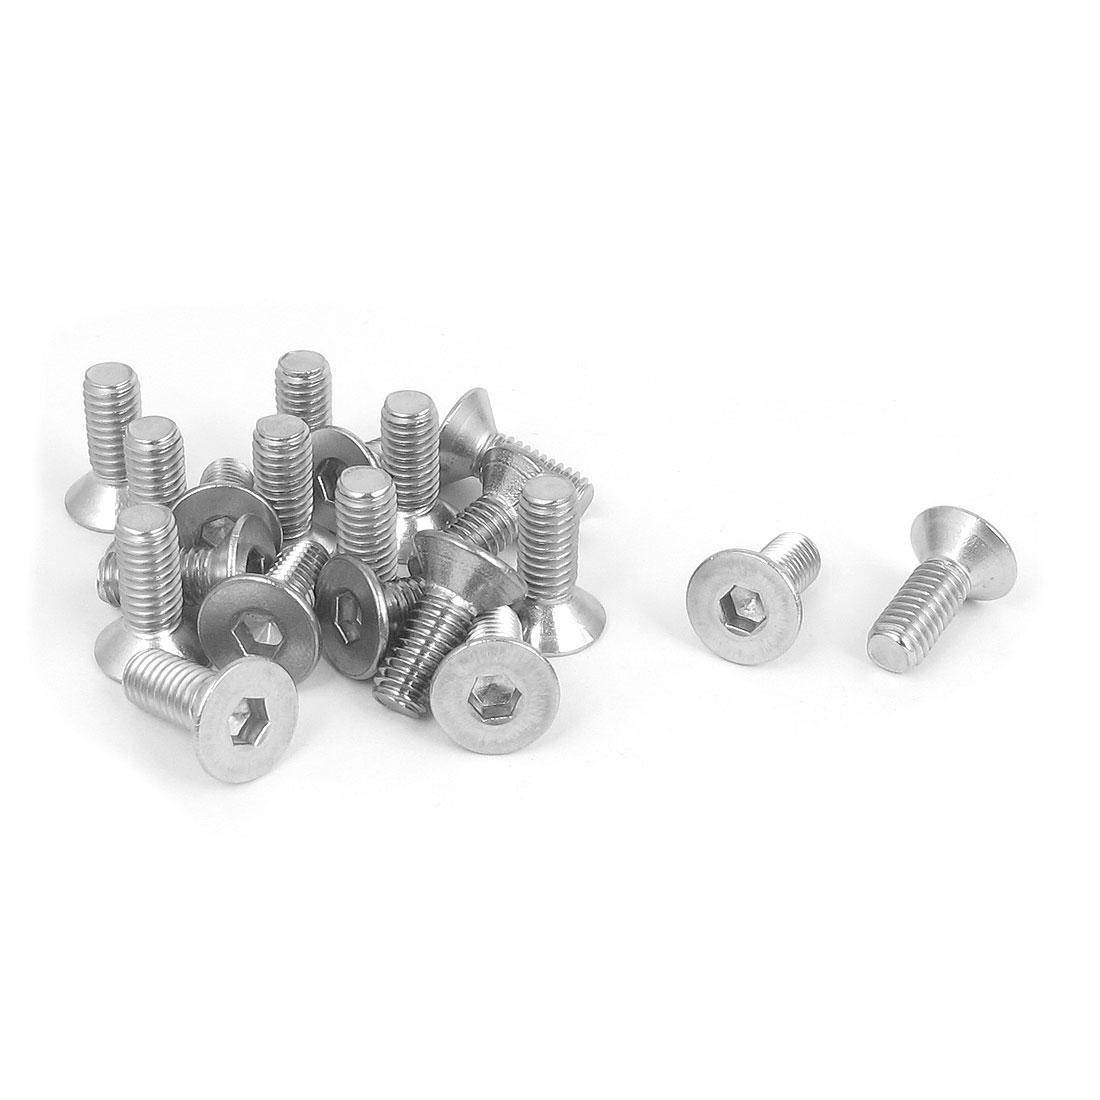 M6 x 16mm Metric 304 Stainless Steel Hex Socket Countersunk Flat Head Screw Bolts 20PCS